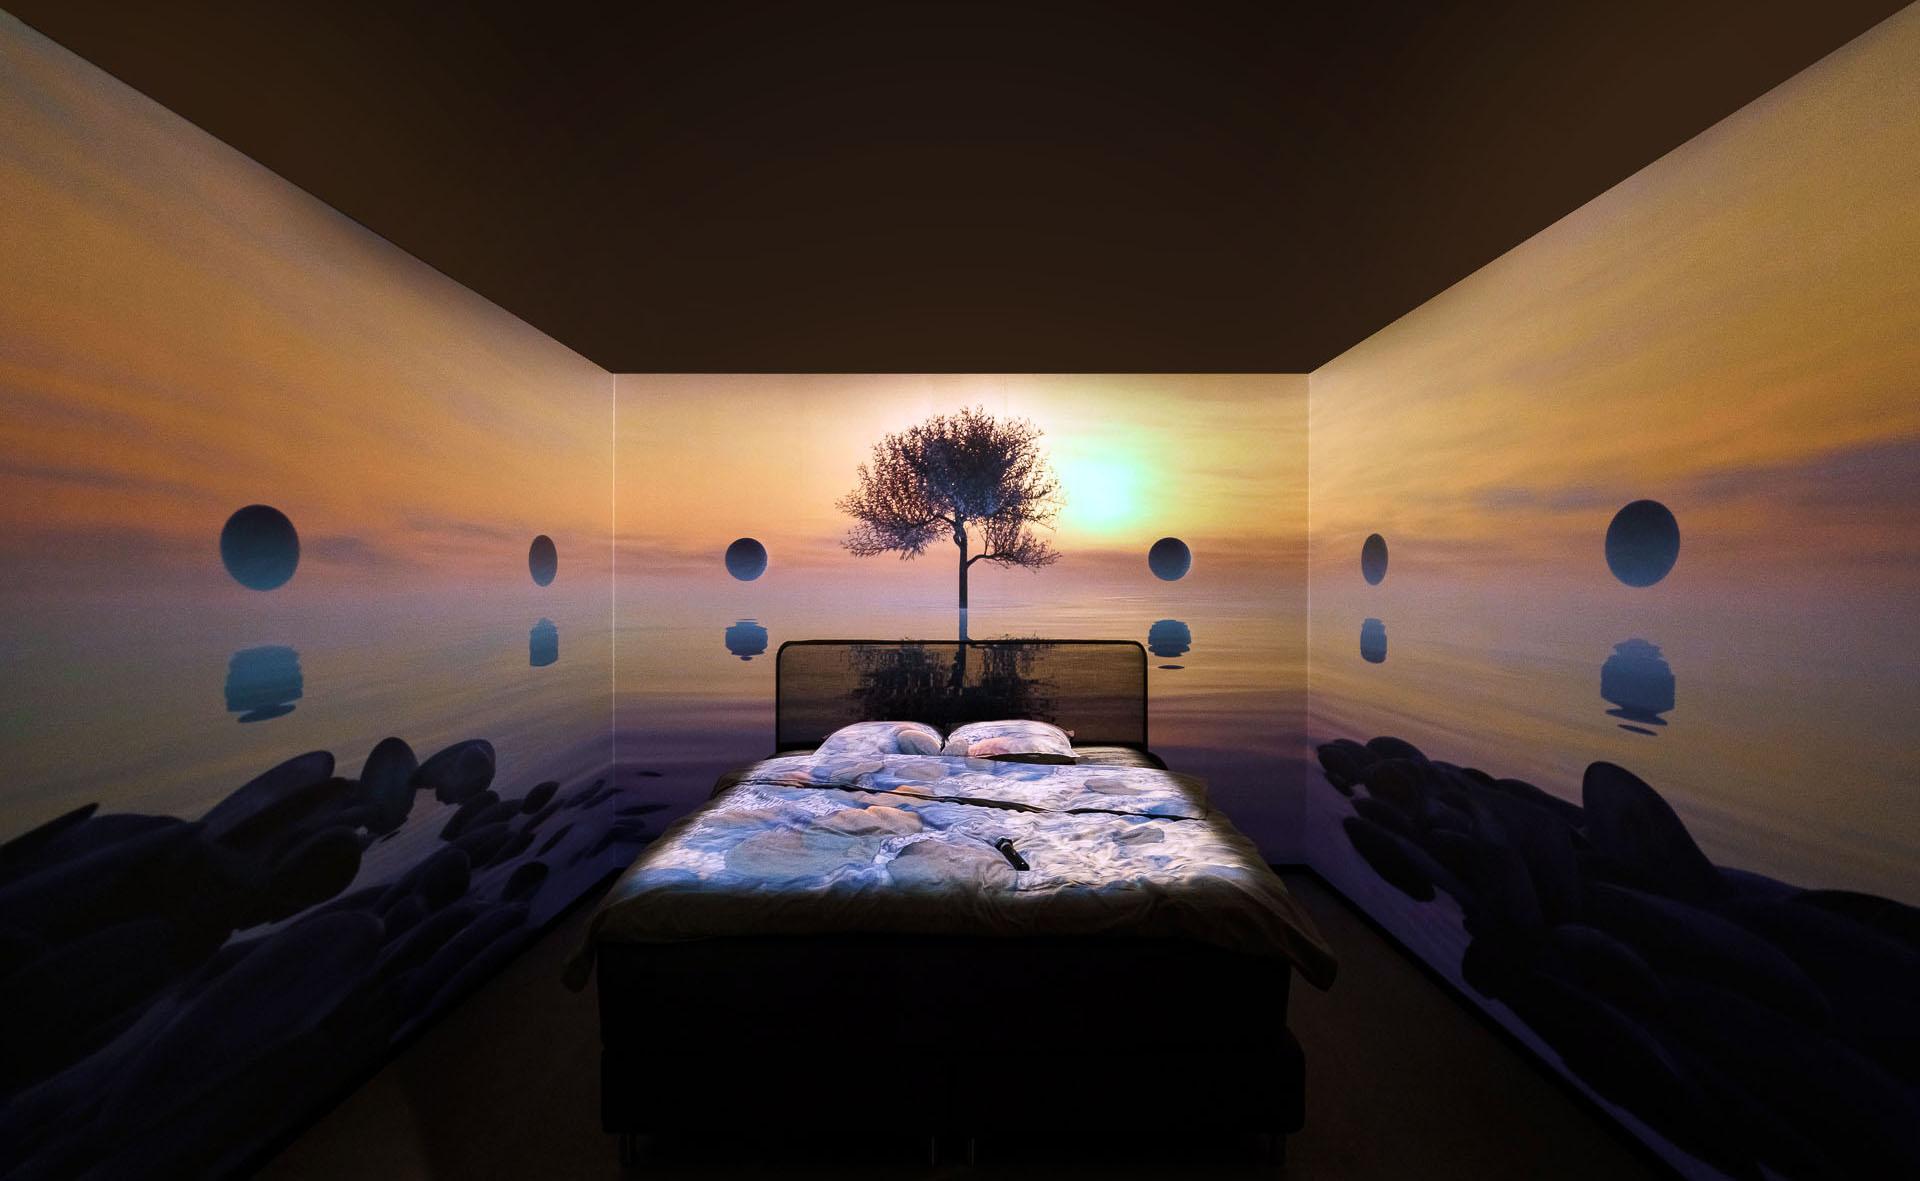 Ikea dream room - Retail futuro - slow shopping